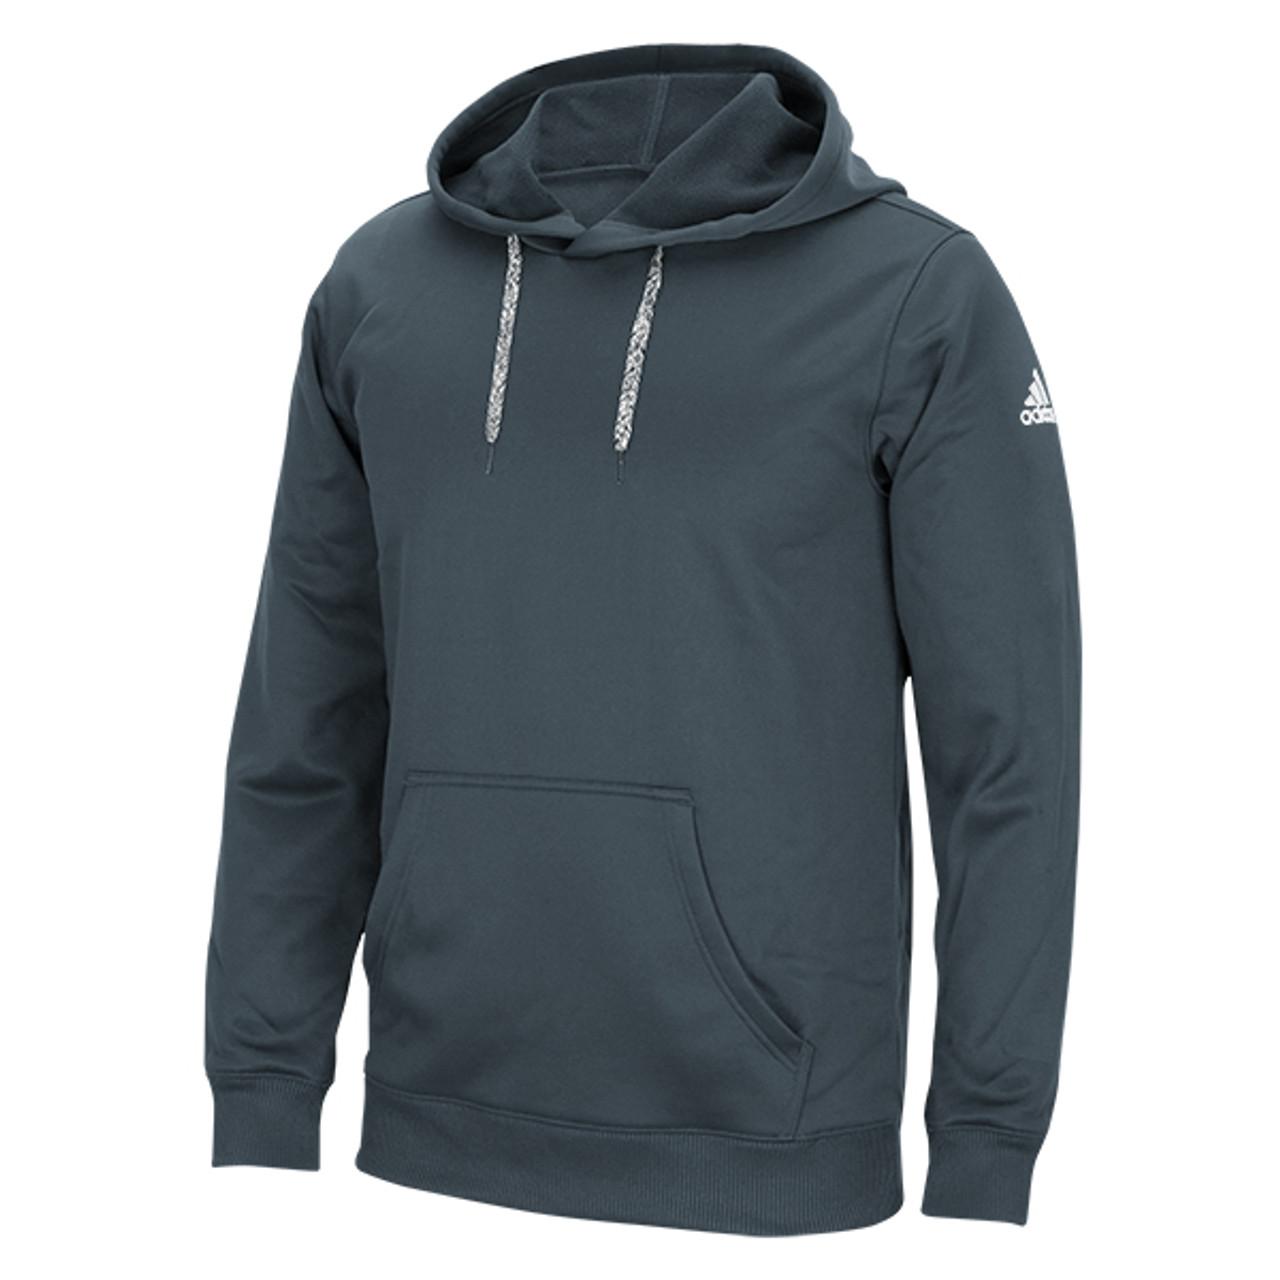 Adidas Onix Tech Fleece Men's Hoodie 359FONX